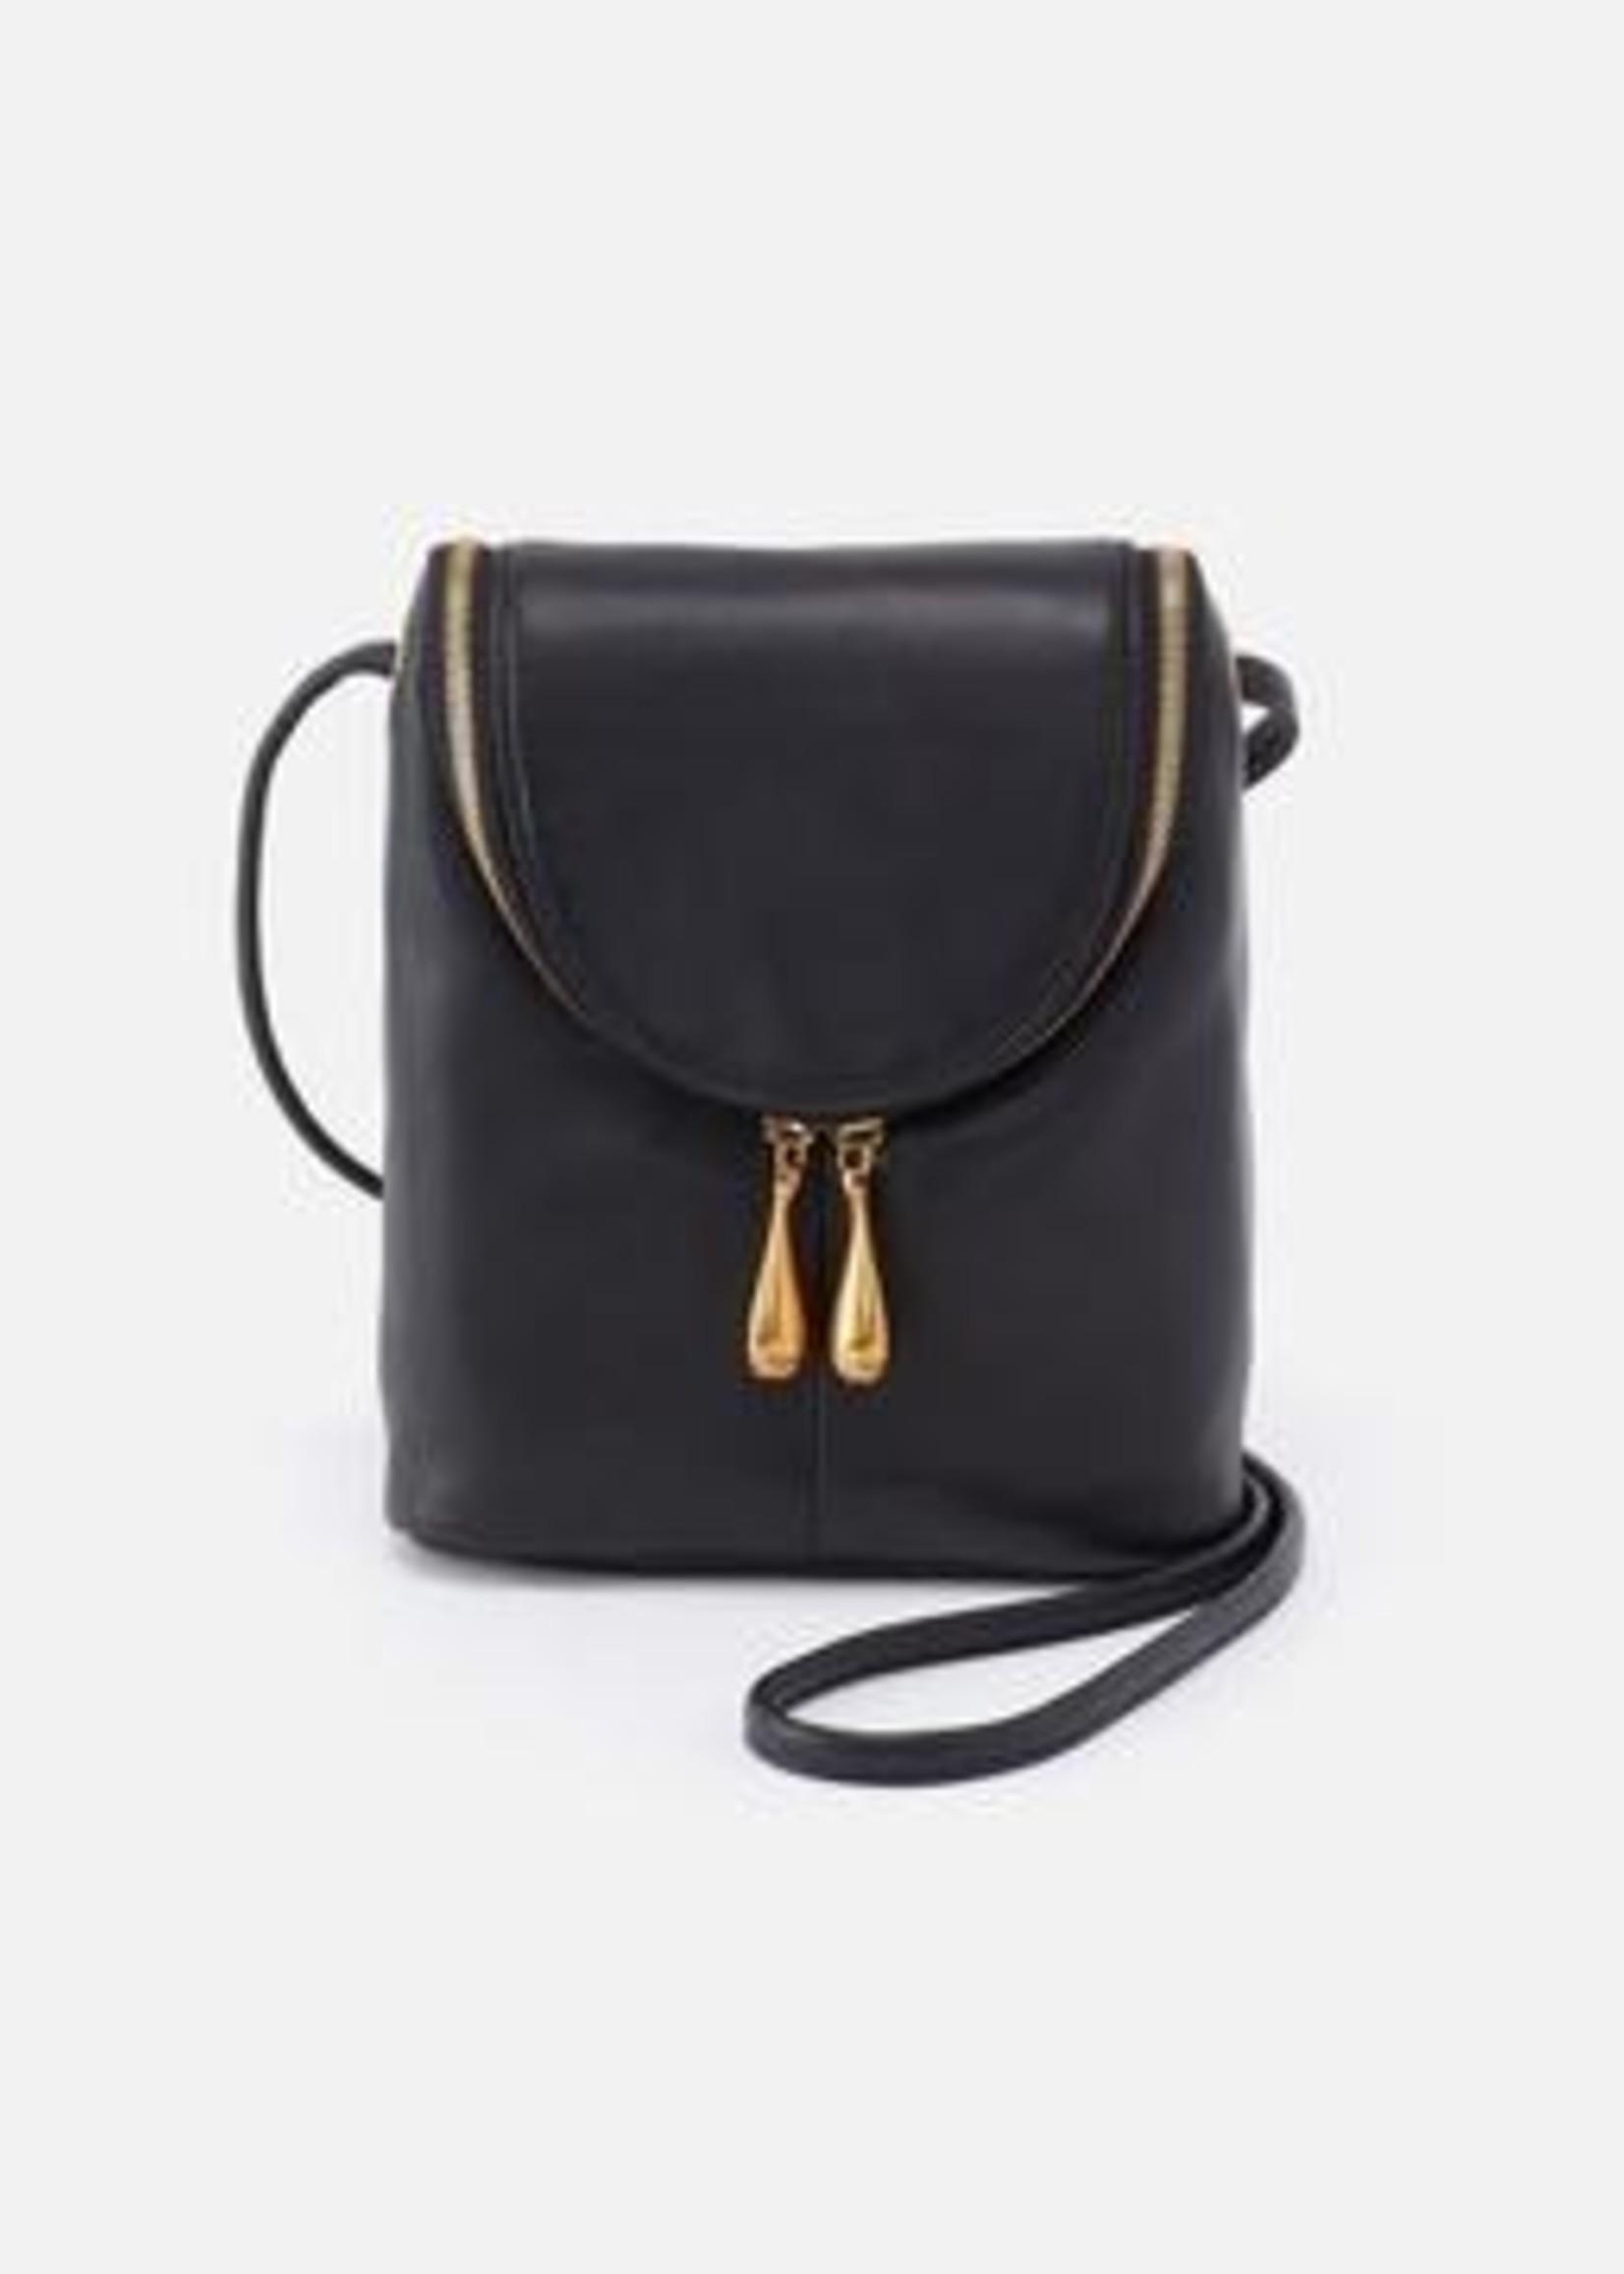 HOBO Bags Fern Crossbody Black